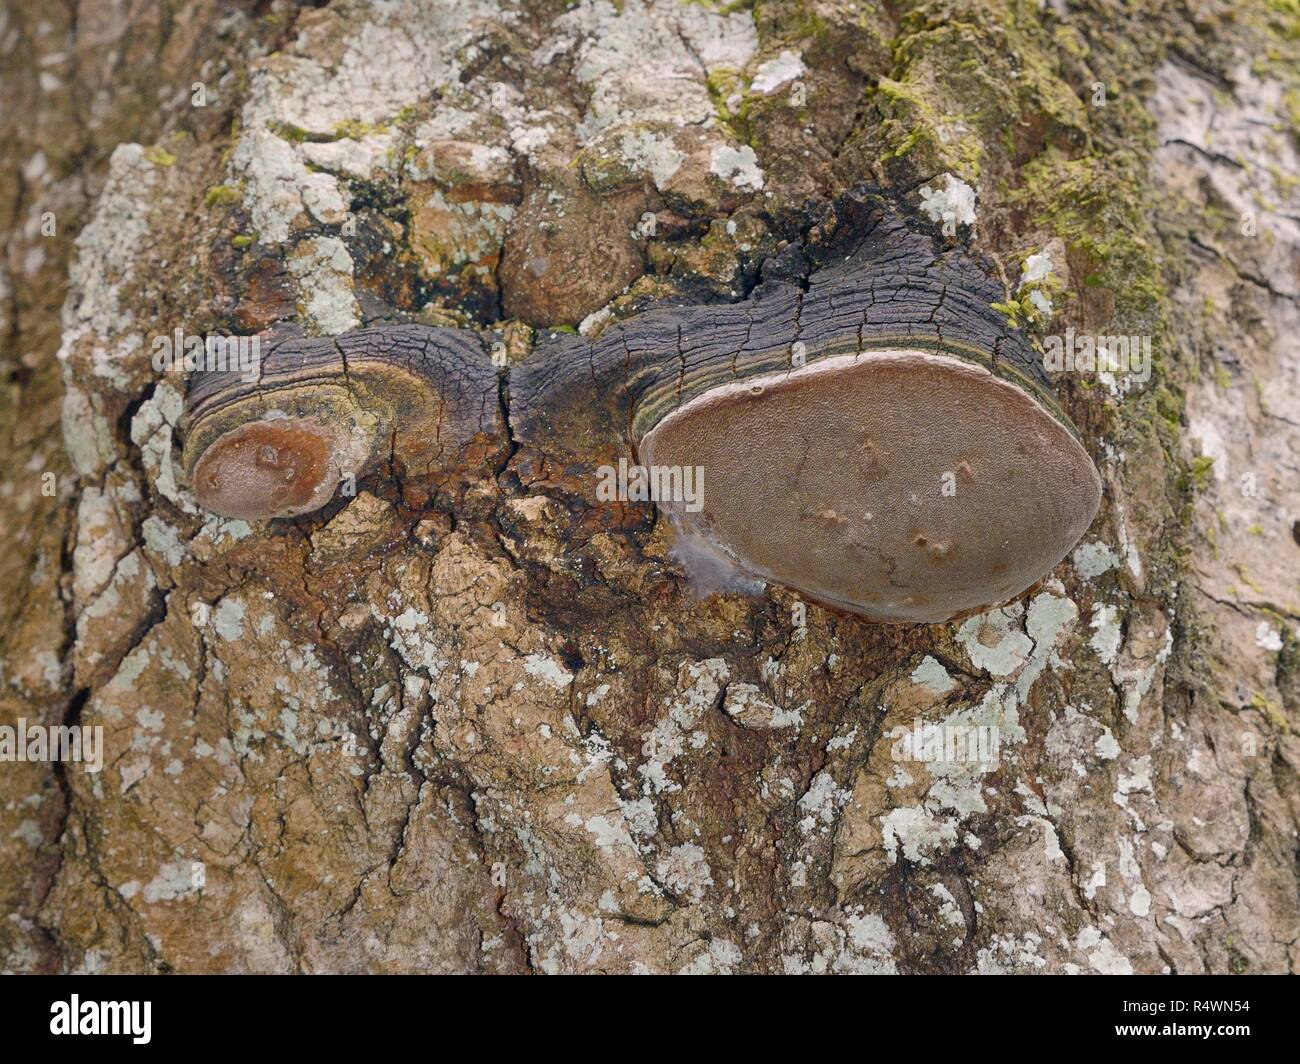 Aspen trunk rot / False tinder conk mushroom (Phellinus tremulae) fungus fruiting bodies visible on an Old Aspen tree (Populus tremula) trunk, Estonia - Stock Image